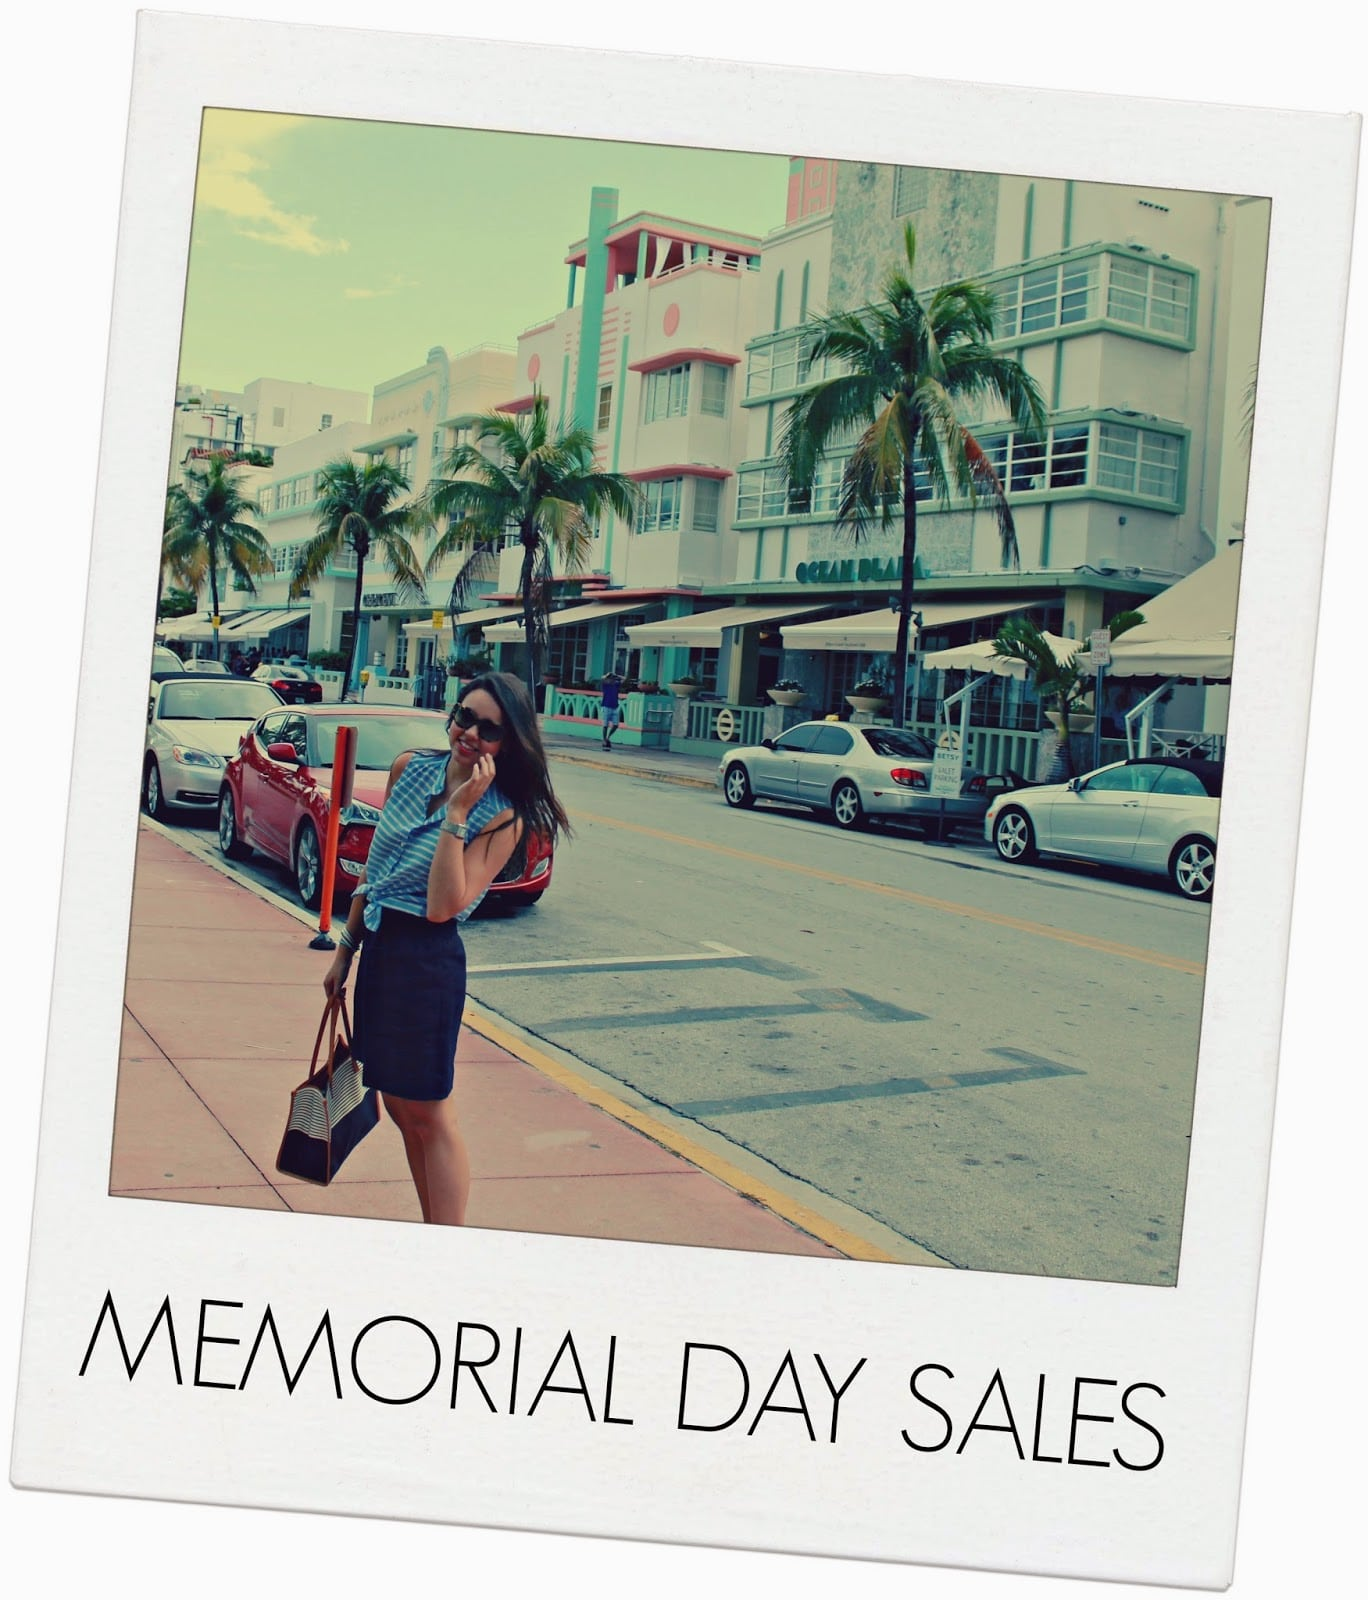 Let's Shop: Memorial Day Weekend Sales